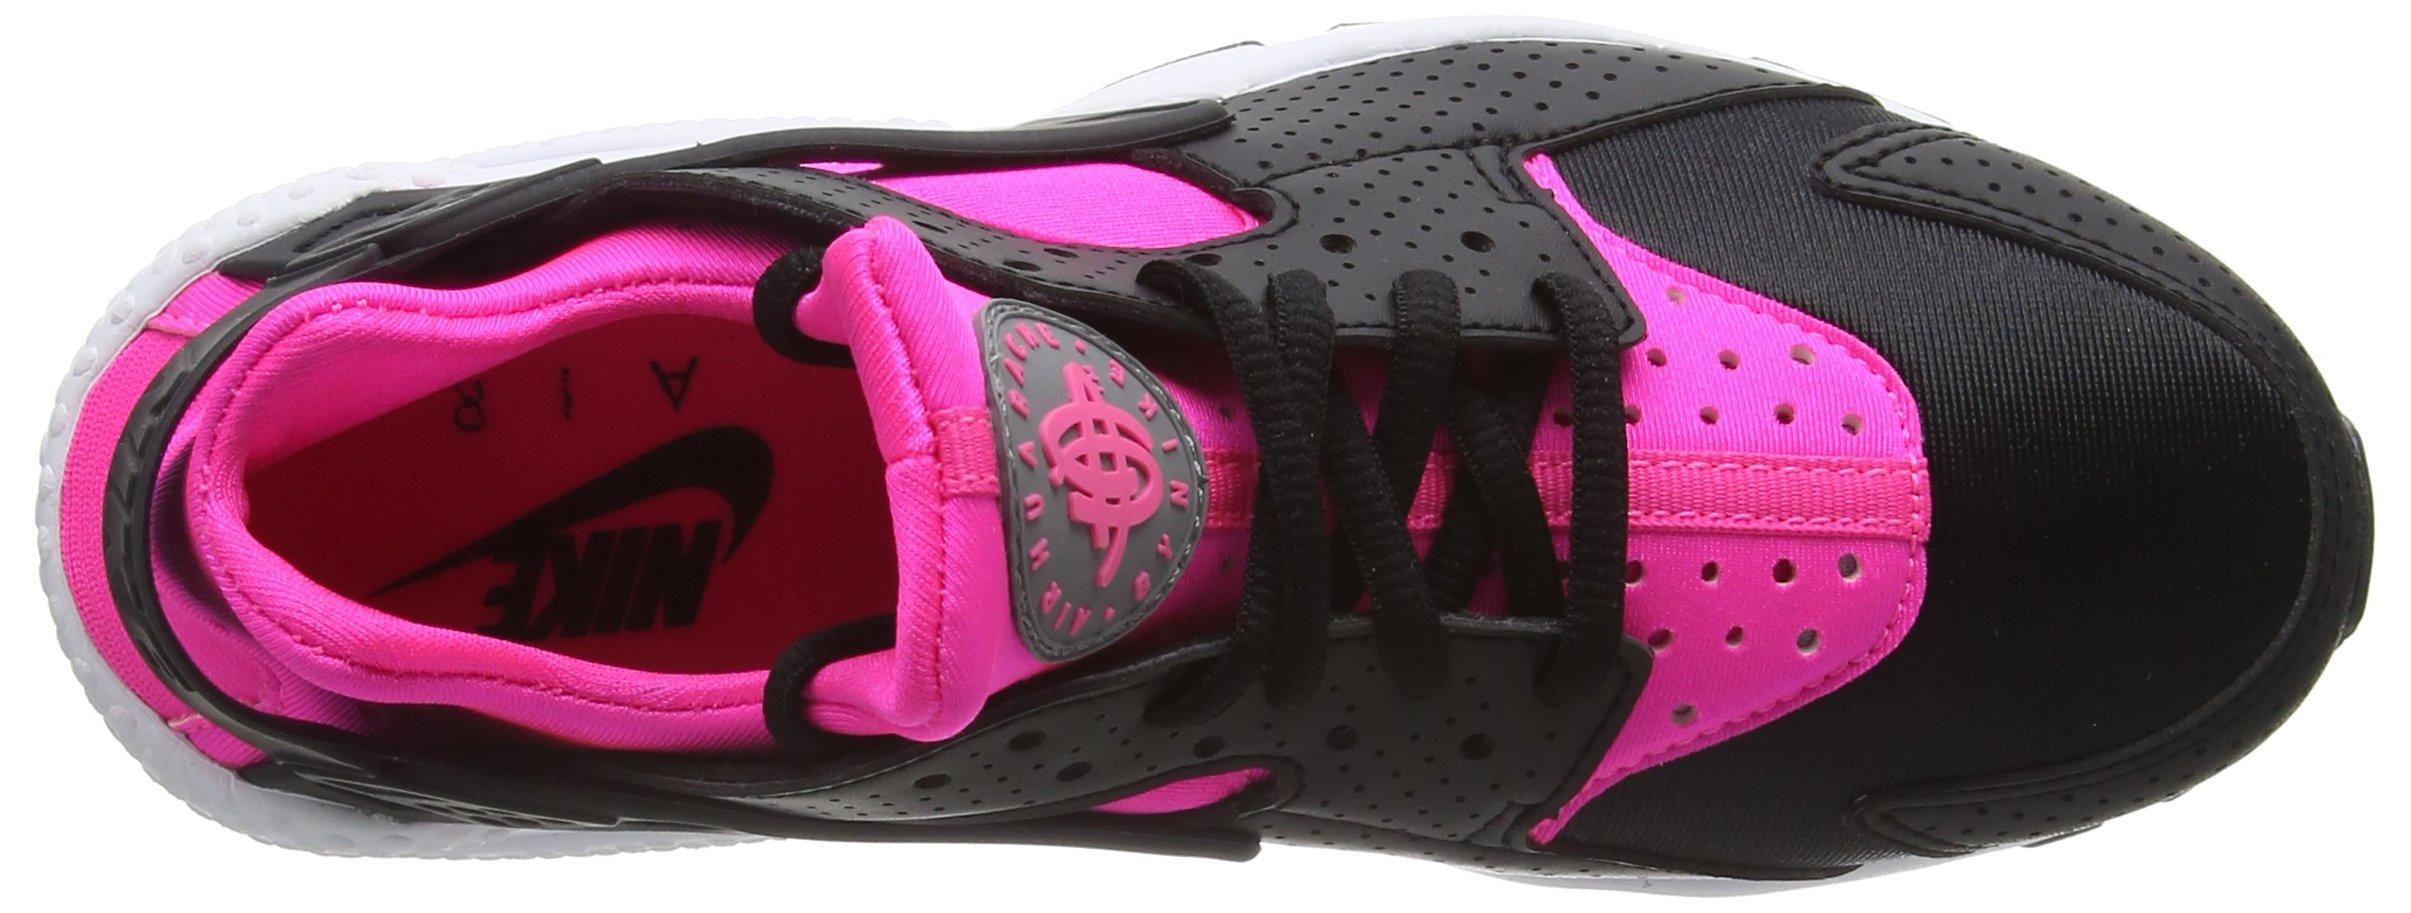 819vLUc5x L - Nike Women's Wmns Air Huarache Running Shoes